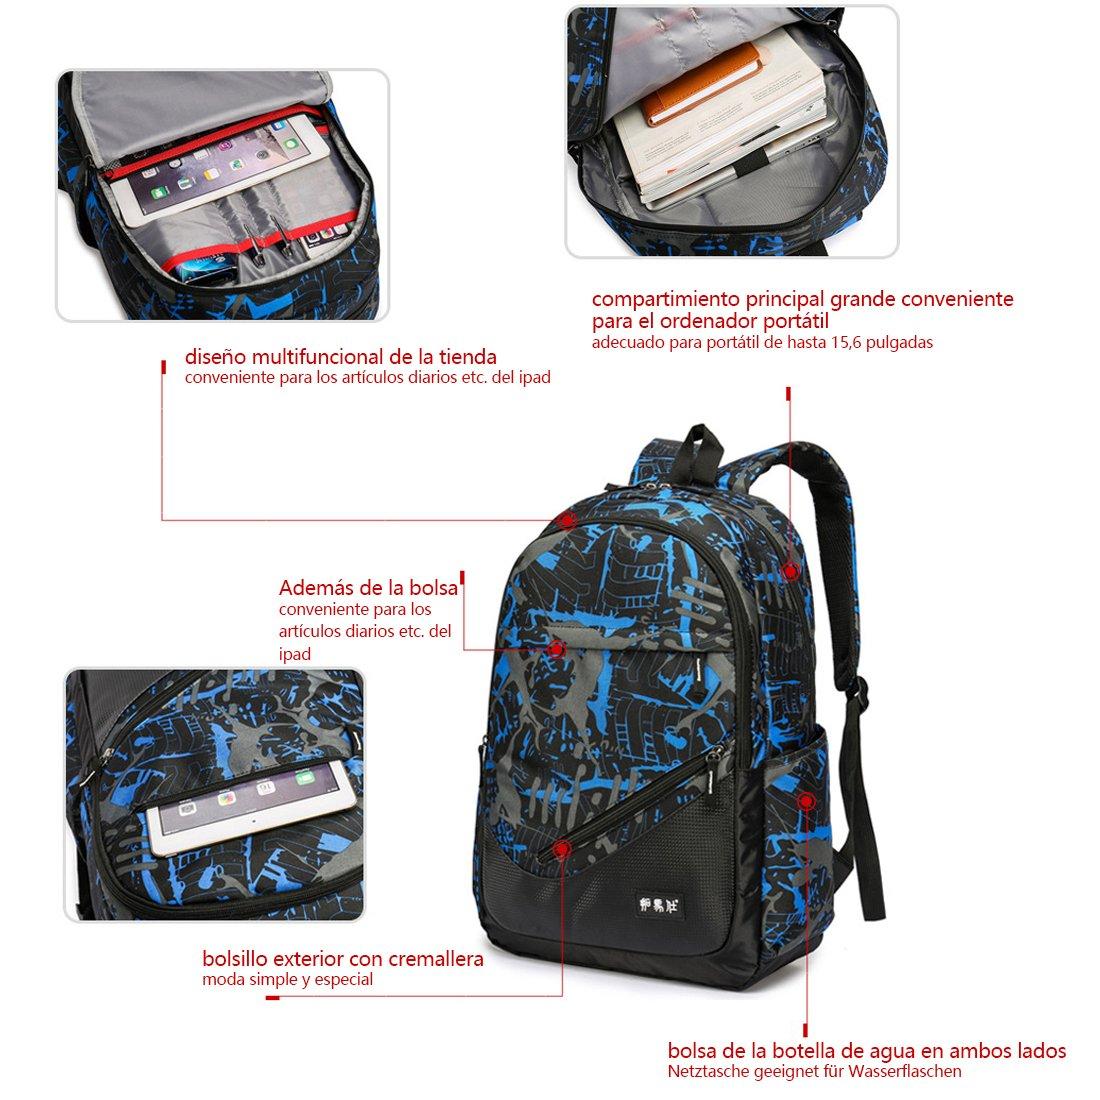 Maod juveniles Backpack Impermeables Mochila de Ordenador Impresión Bolsos Escolares portatil mochilas escolares 15.6 Pulgadas mochila (Azul): Amazon.es: ...